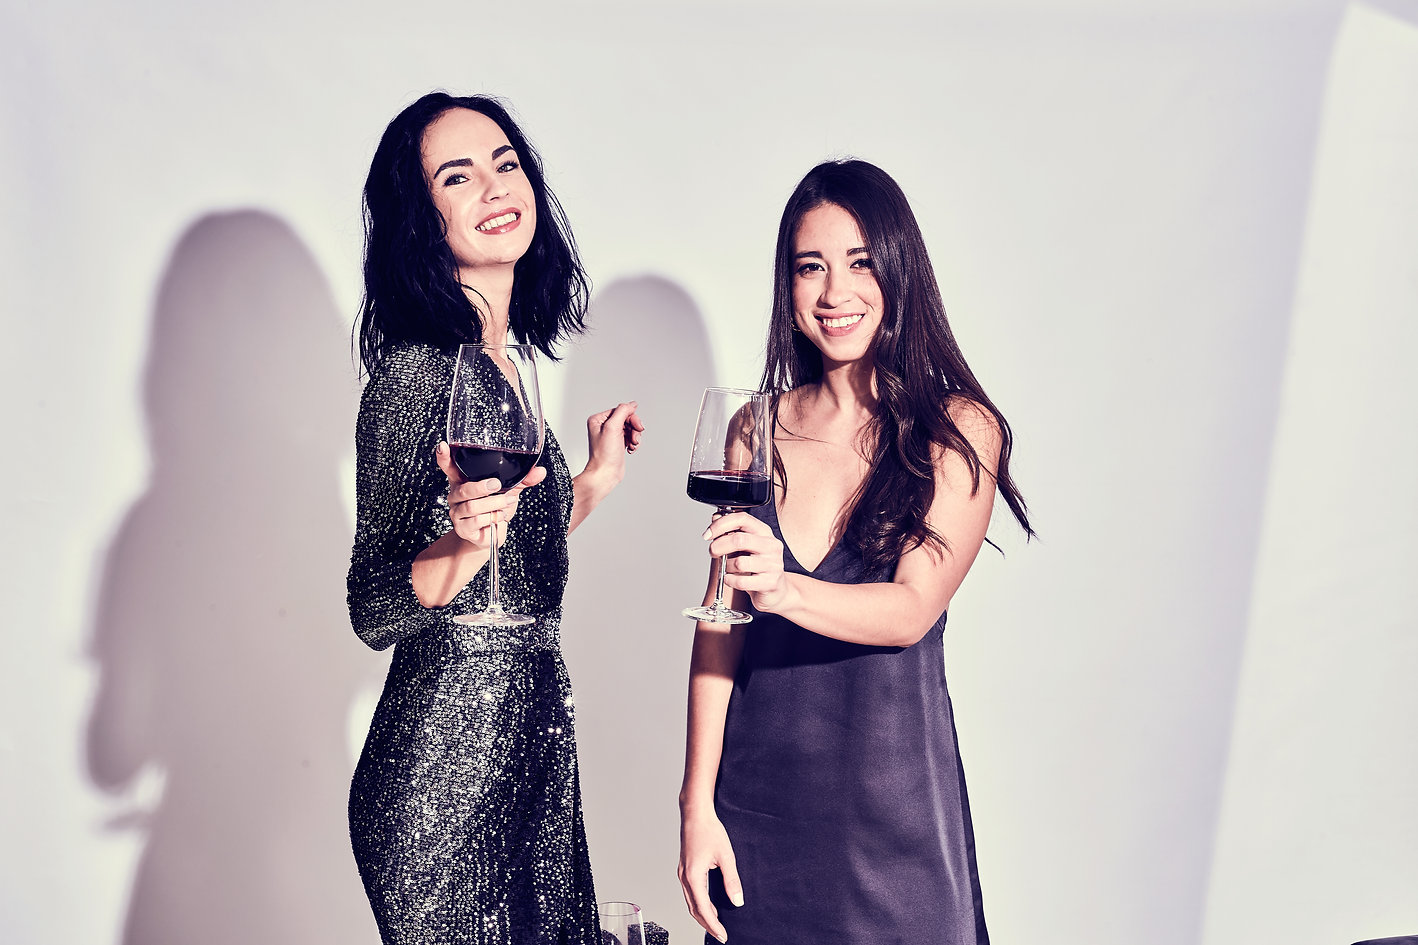 Glamorous-women-drinking-winejpg.jpg